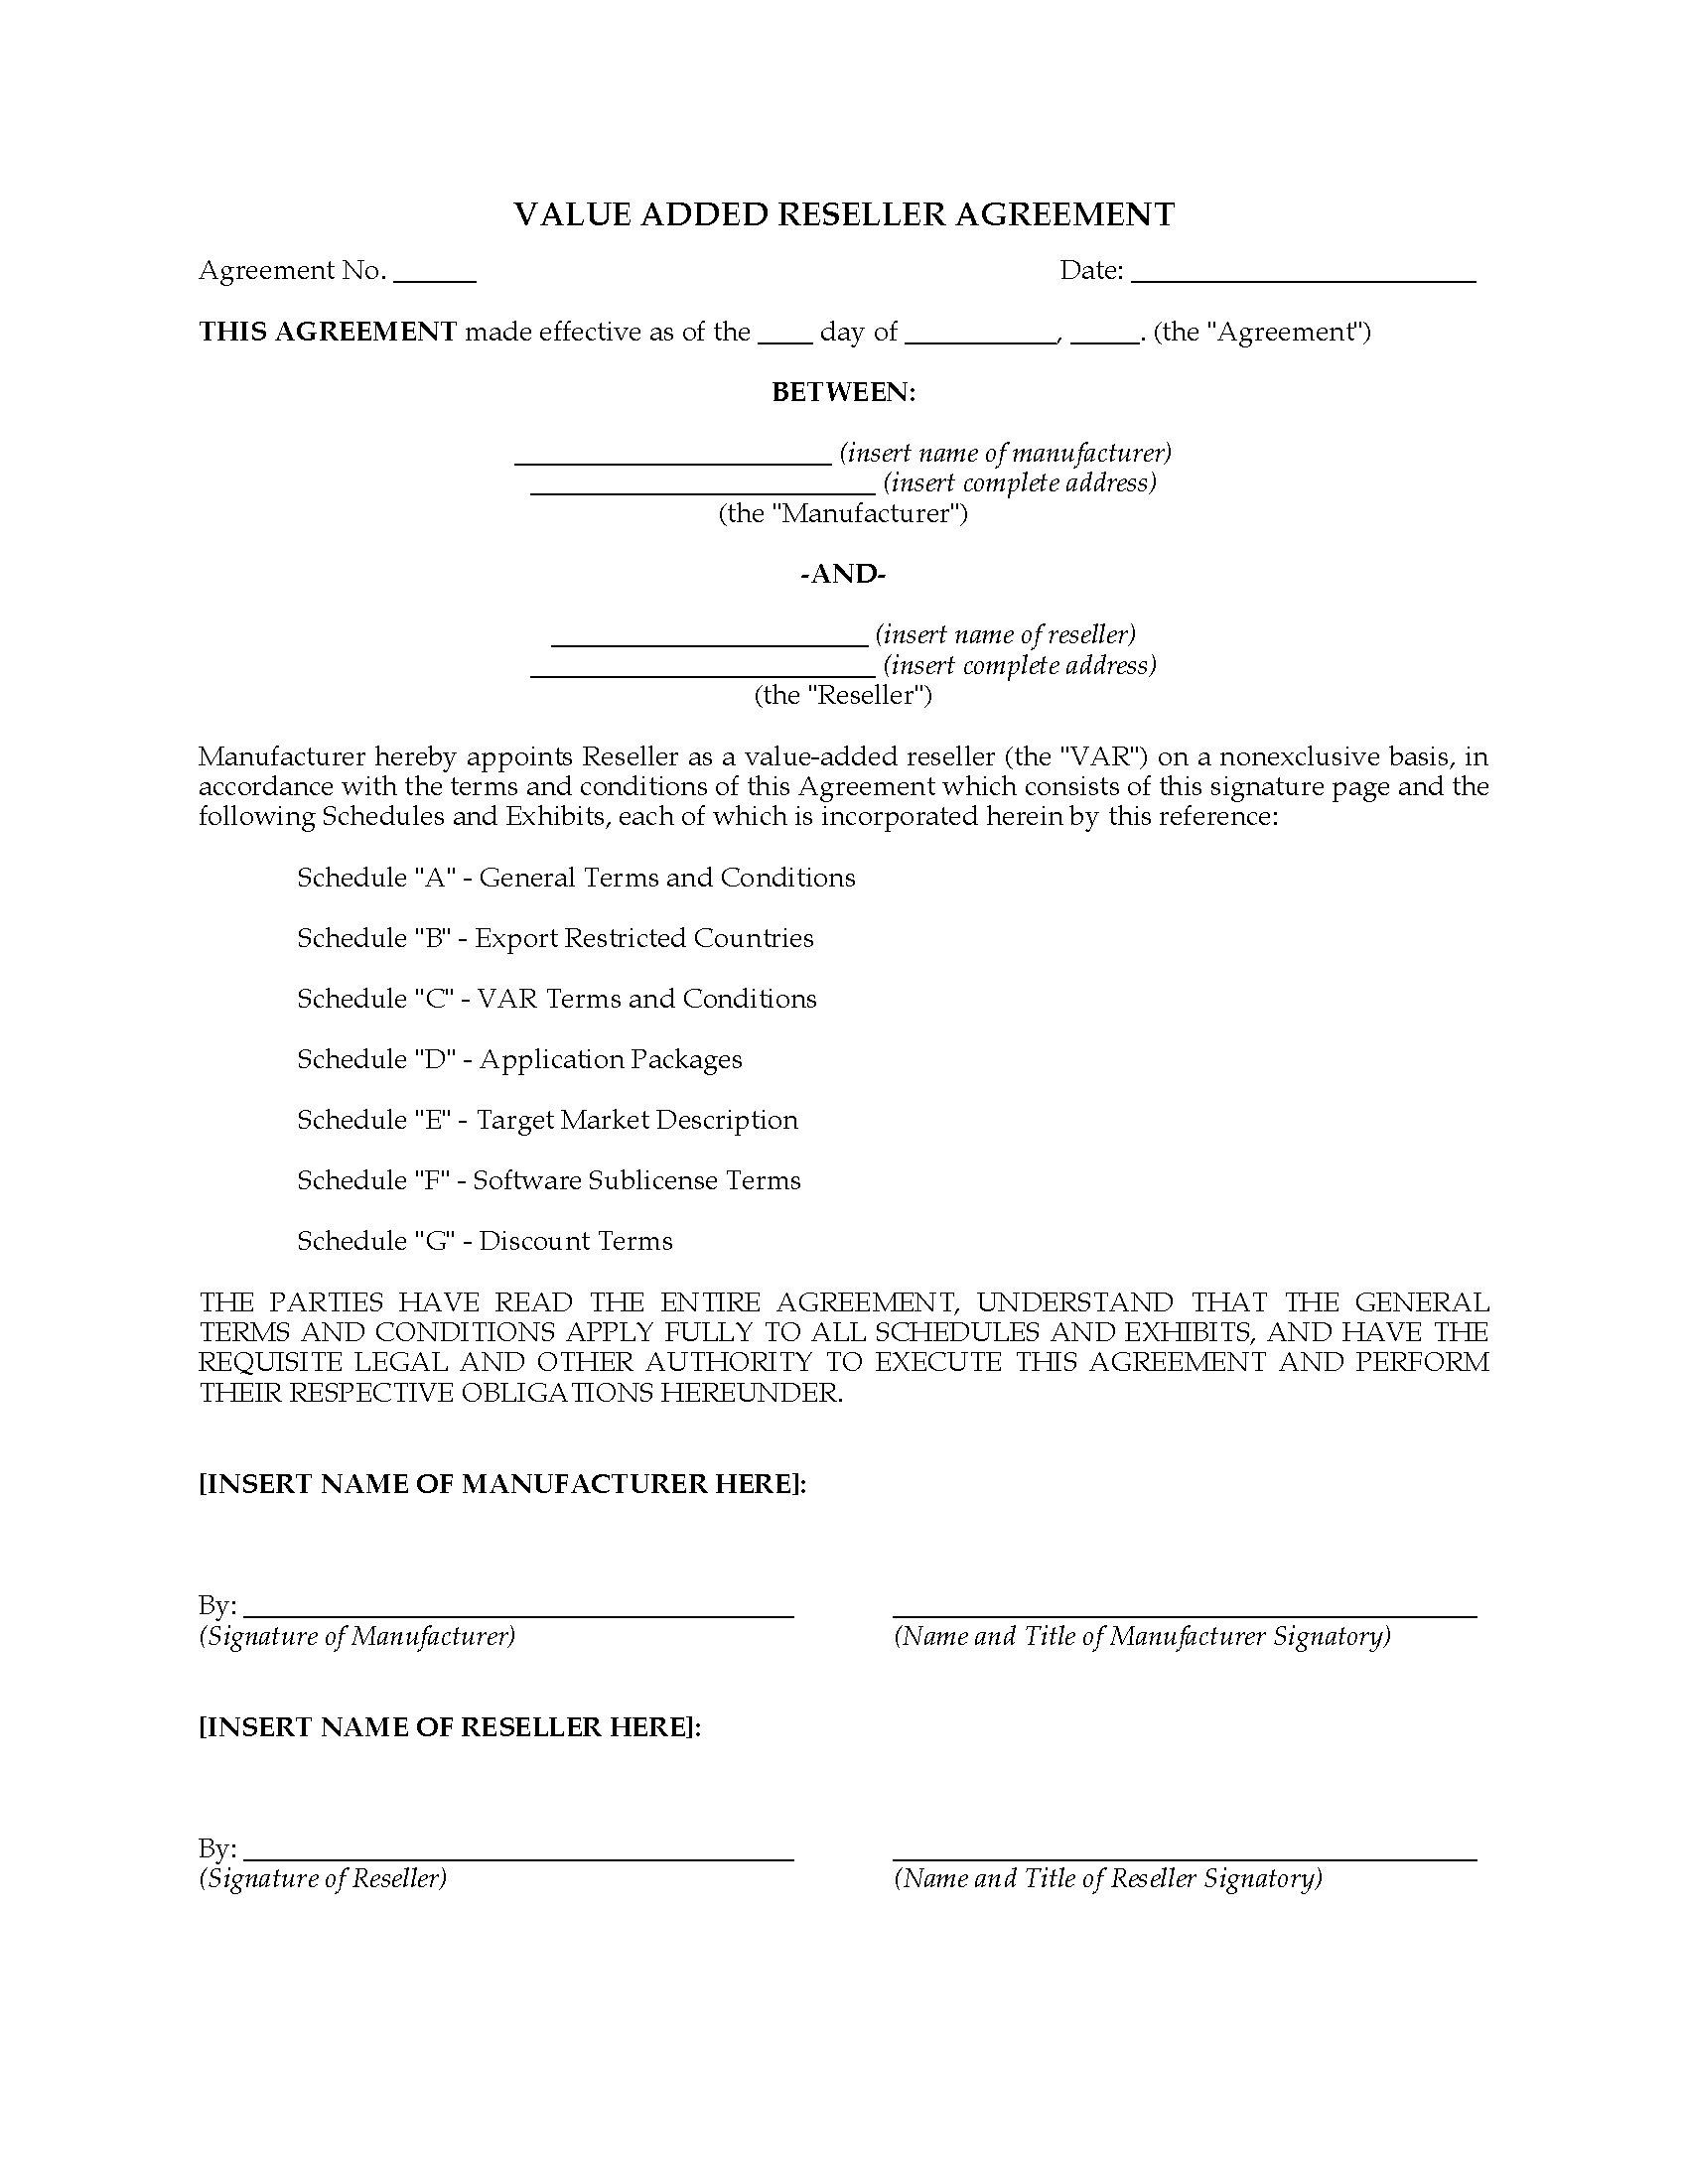 Canada Value Added Computer Reseller VAR Agreement | Legal ...